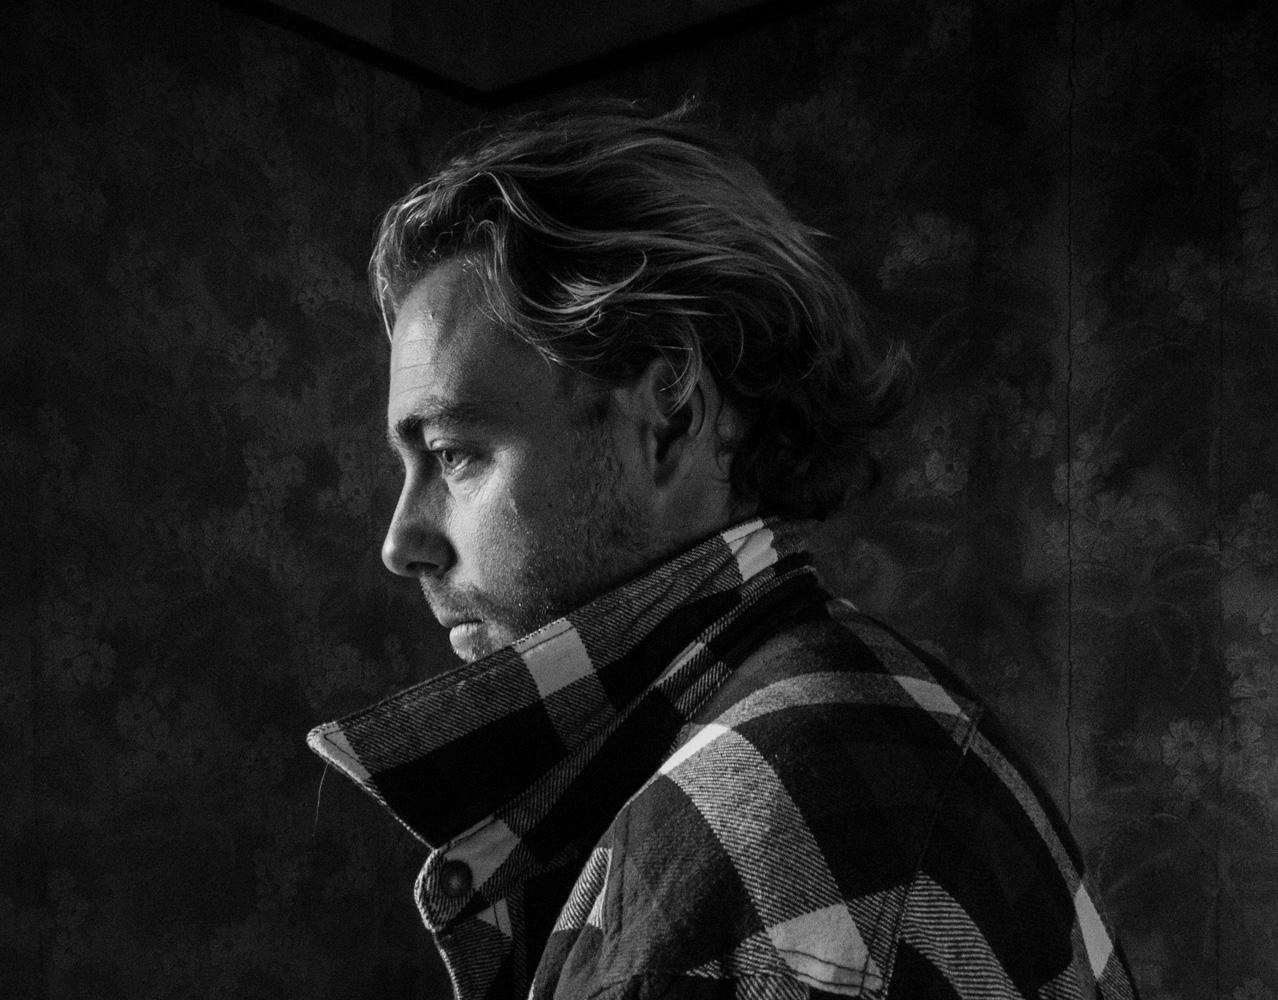 Take striking monochrome portrait shots with the HUAWEI P10 and HUAWEI P10 Plus